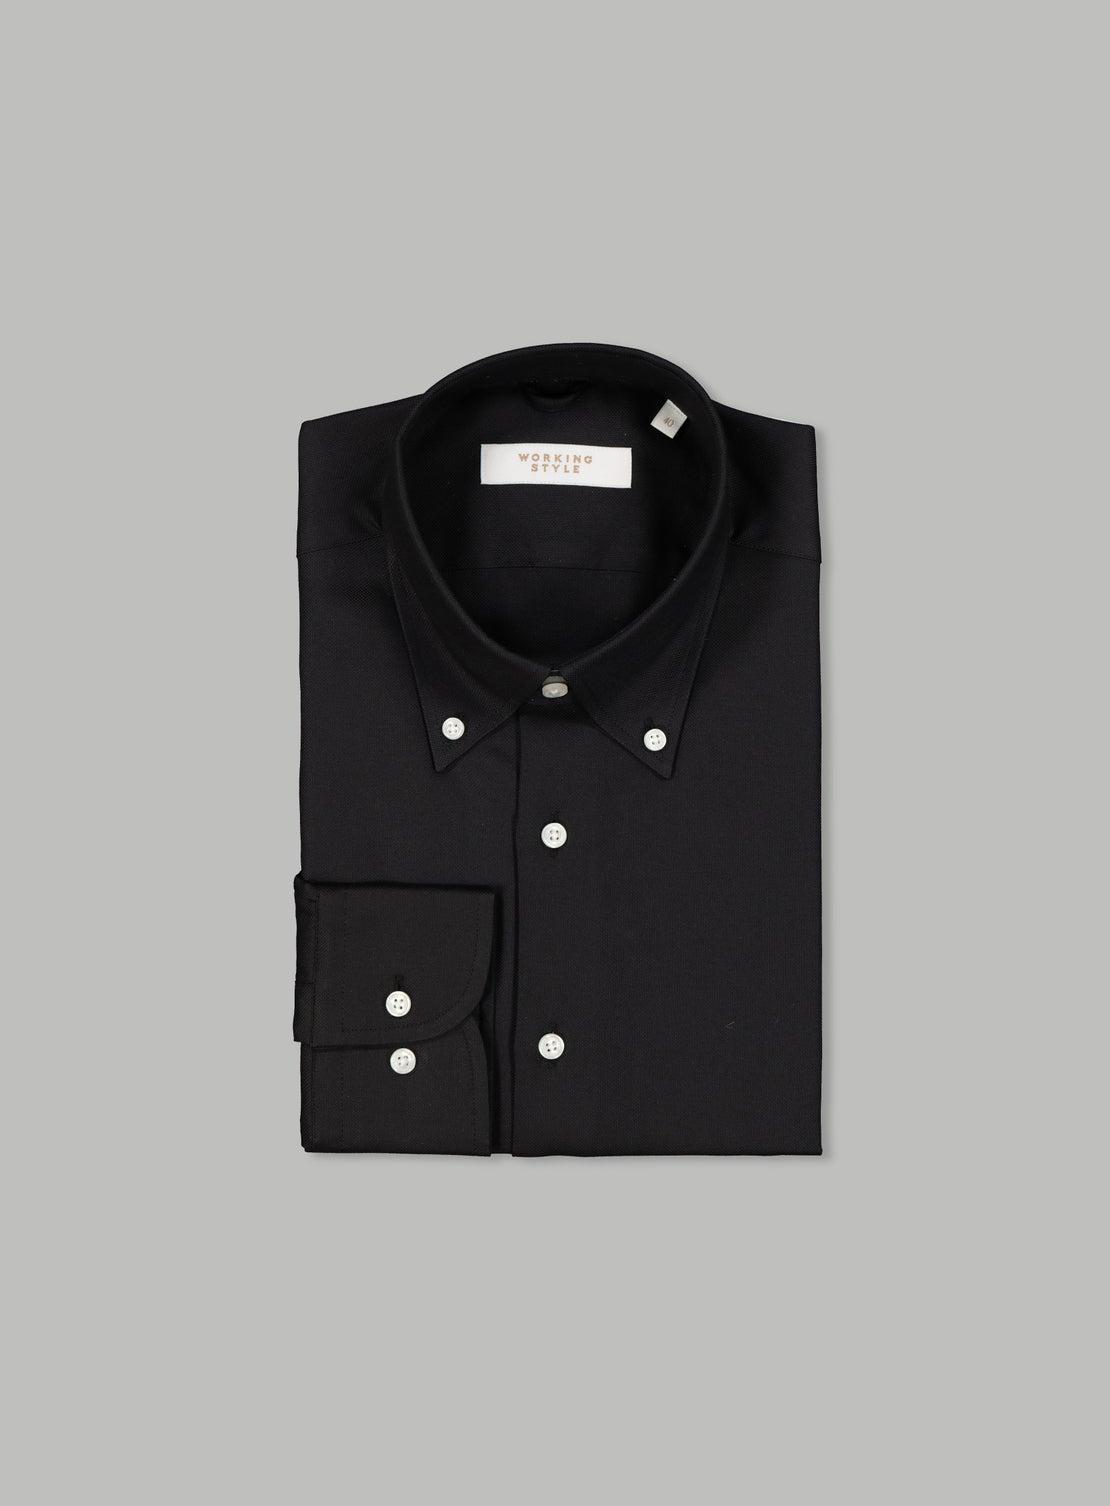 Vasily Black Essential Shirt